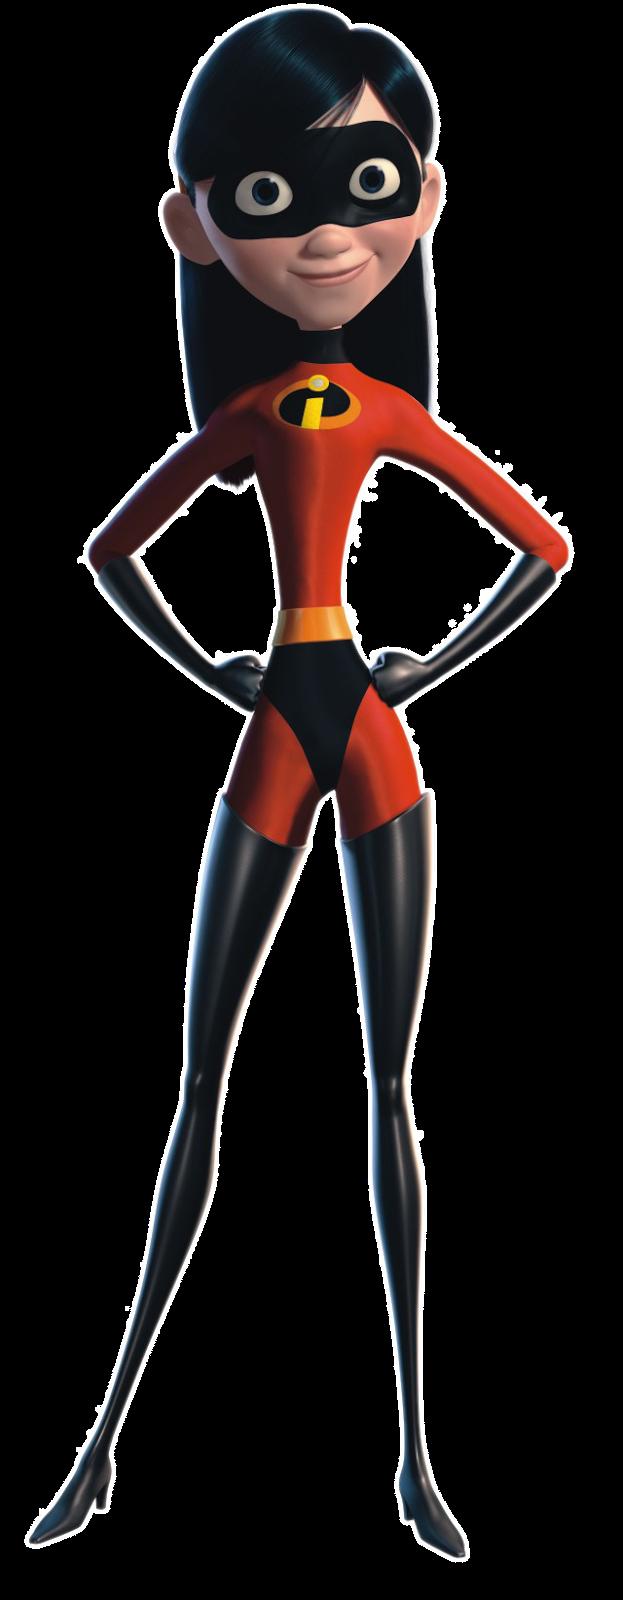 Cartoon Characters The Incredibles Png Los Increibles Personajes Violet Parr Violeta Los Increibles